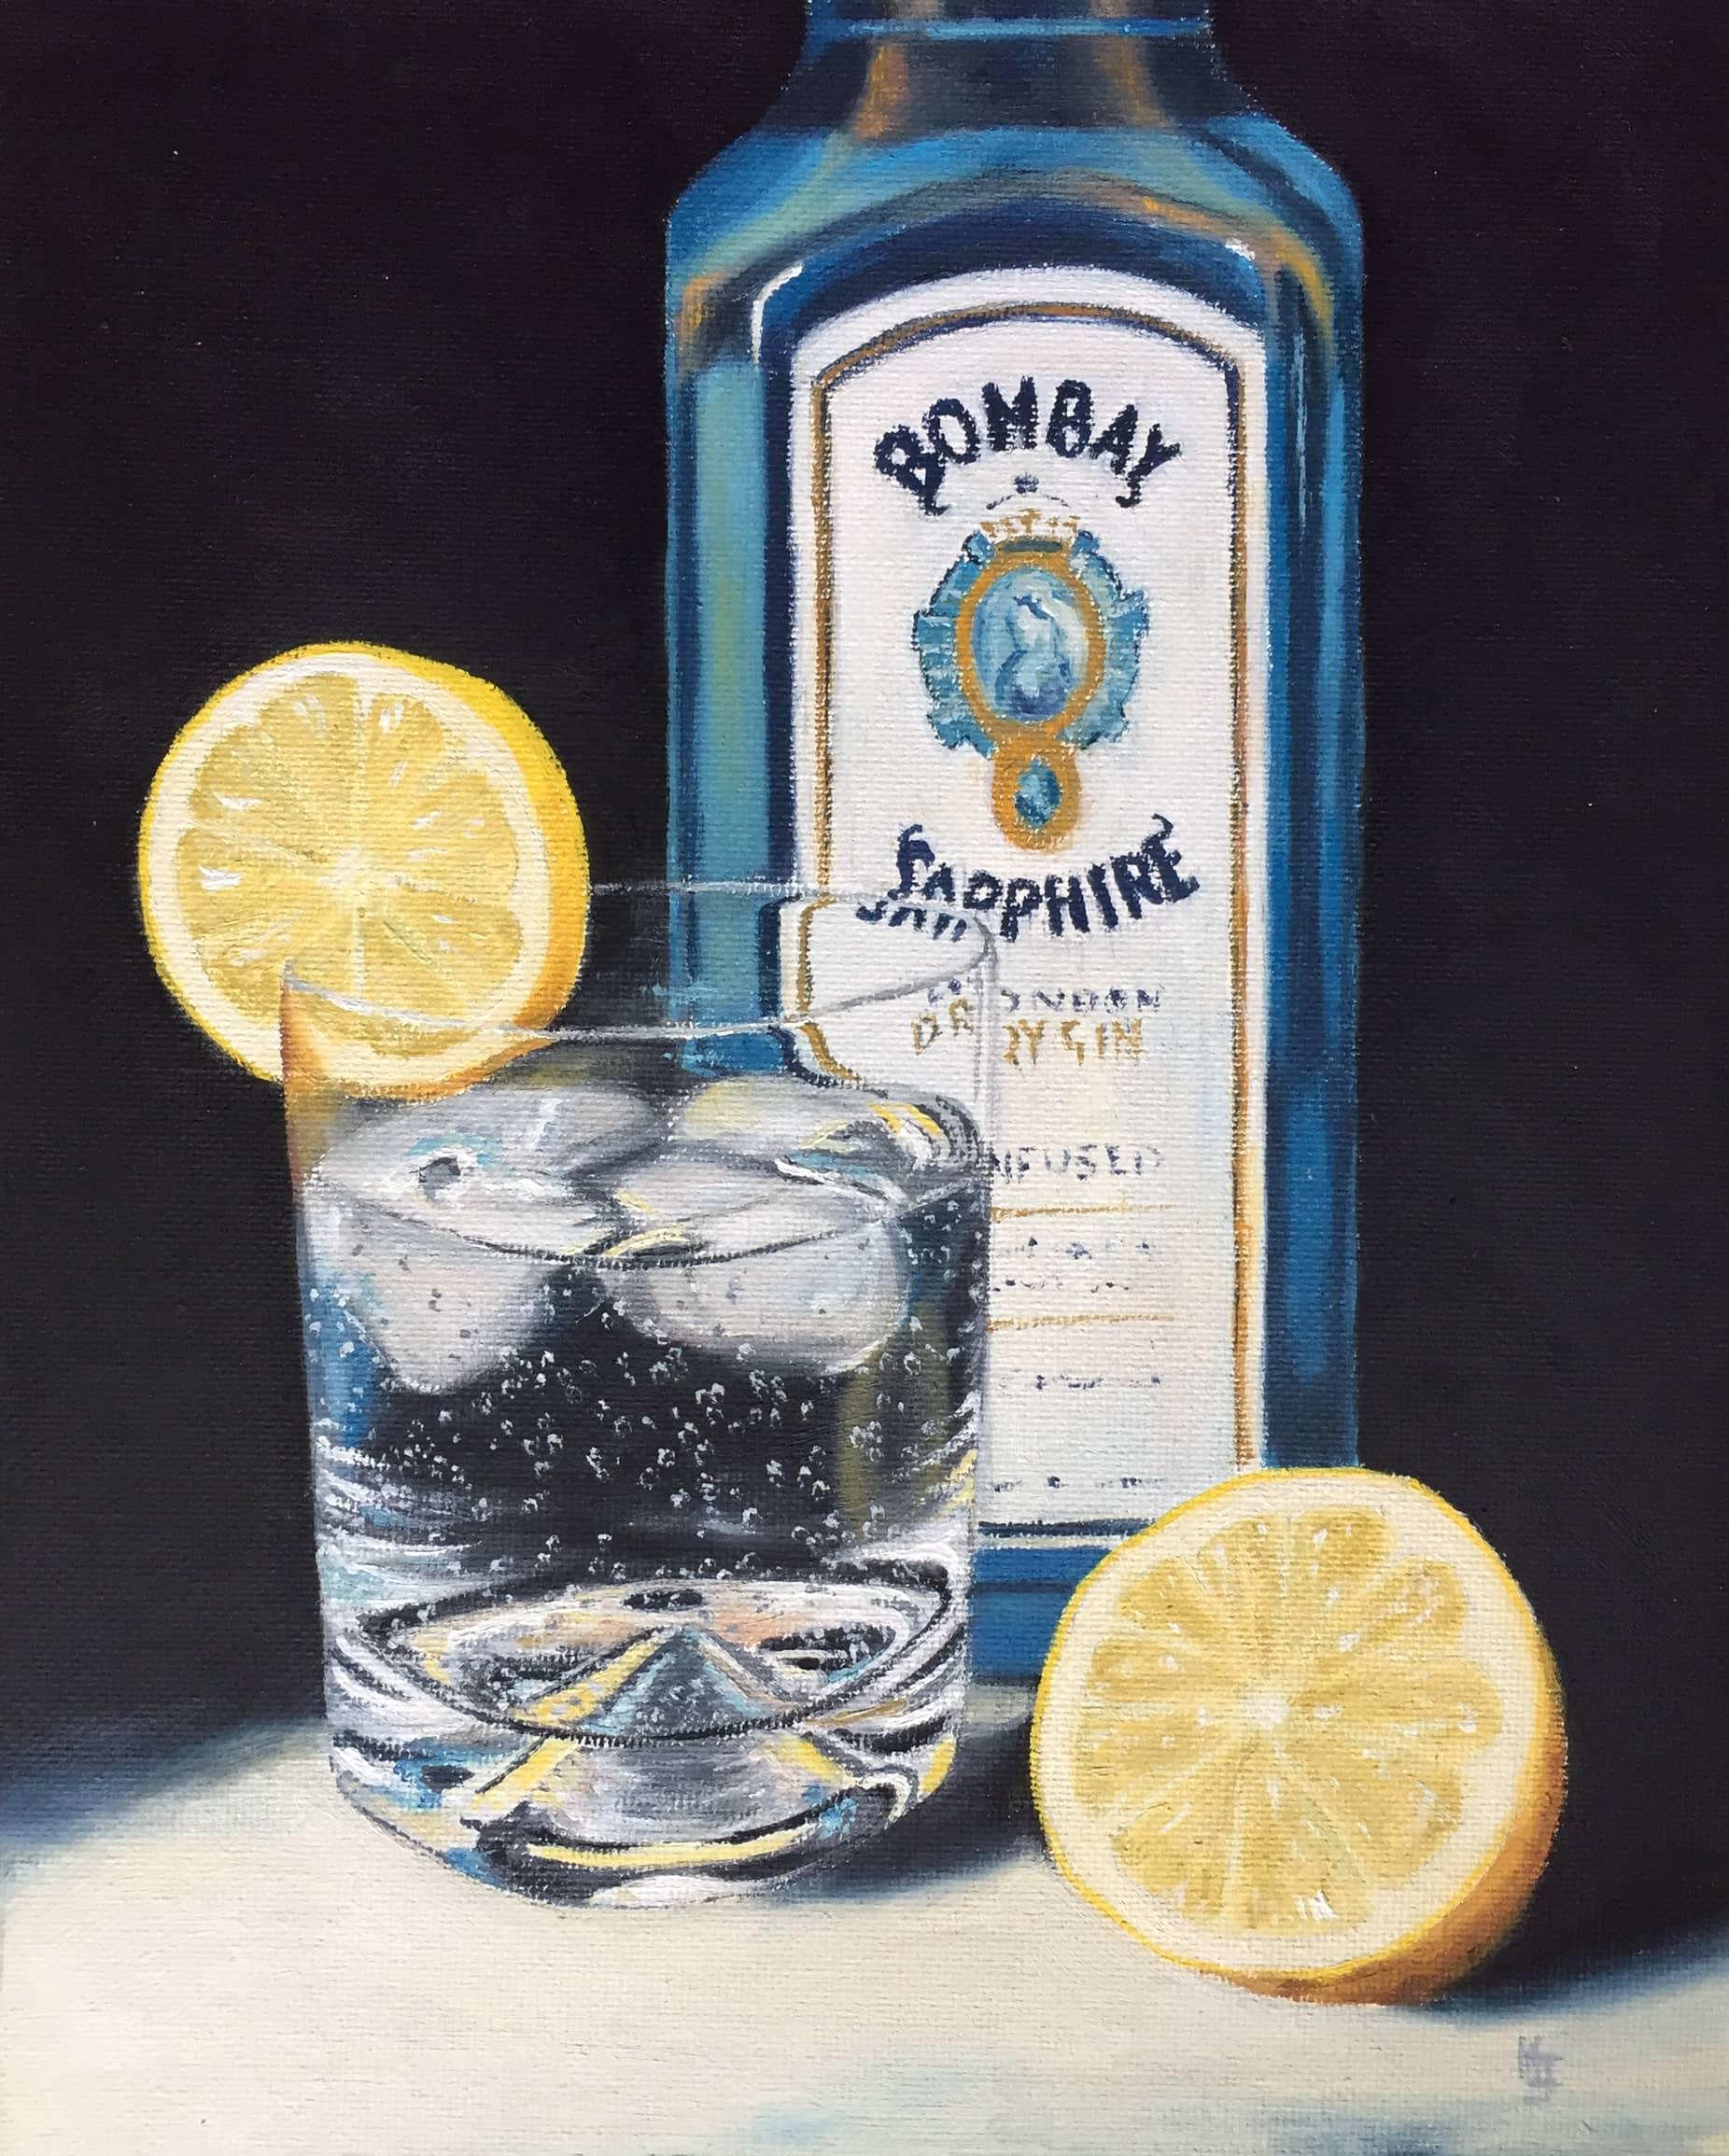 Bombay Sapphire G&T